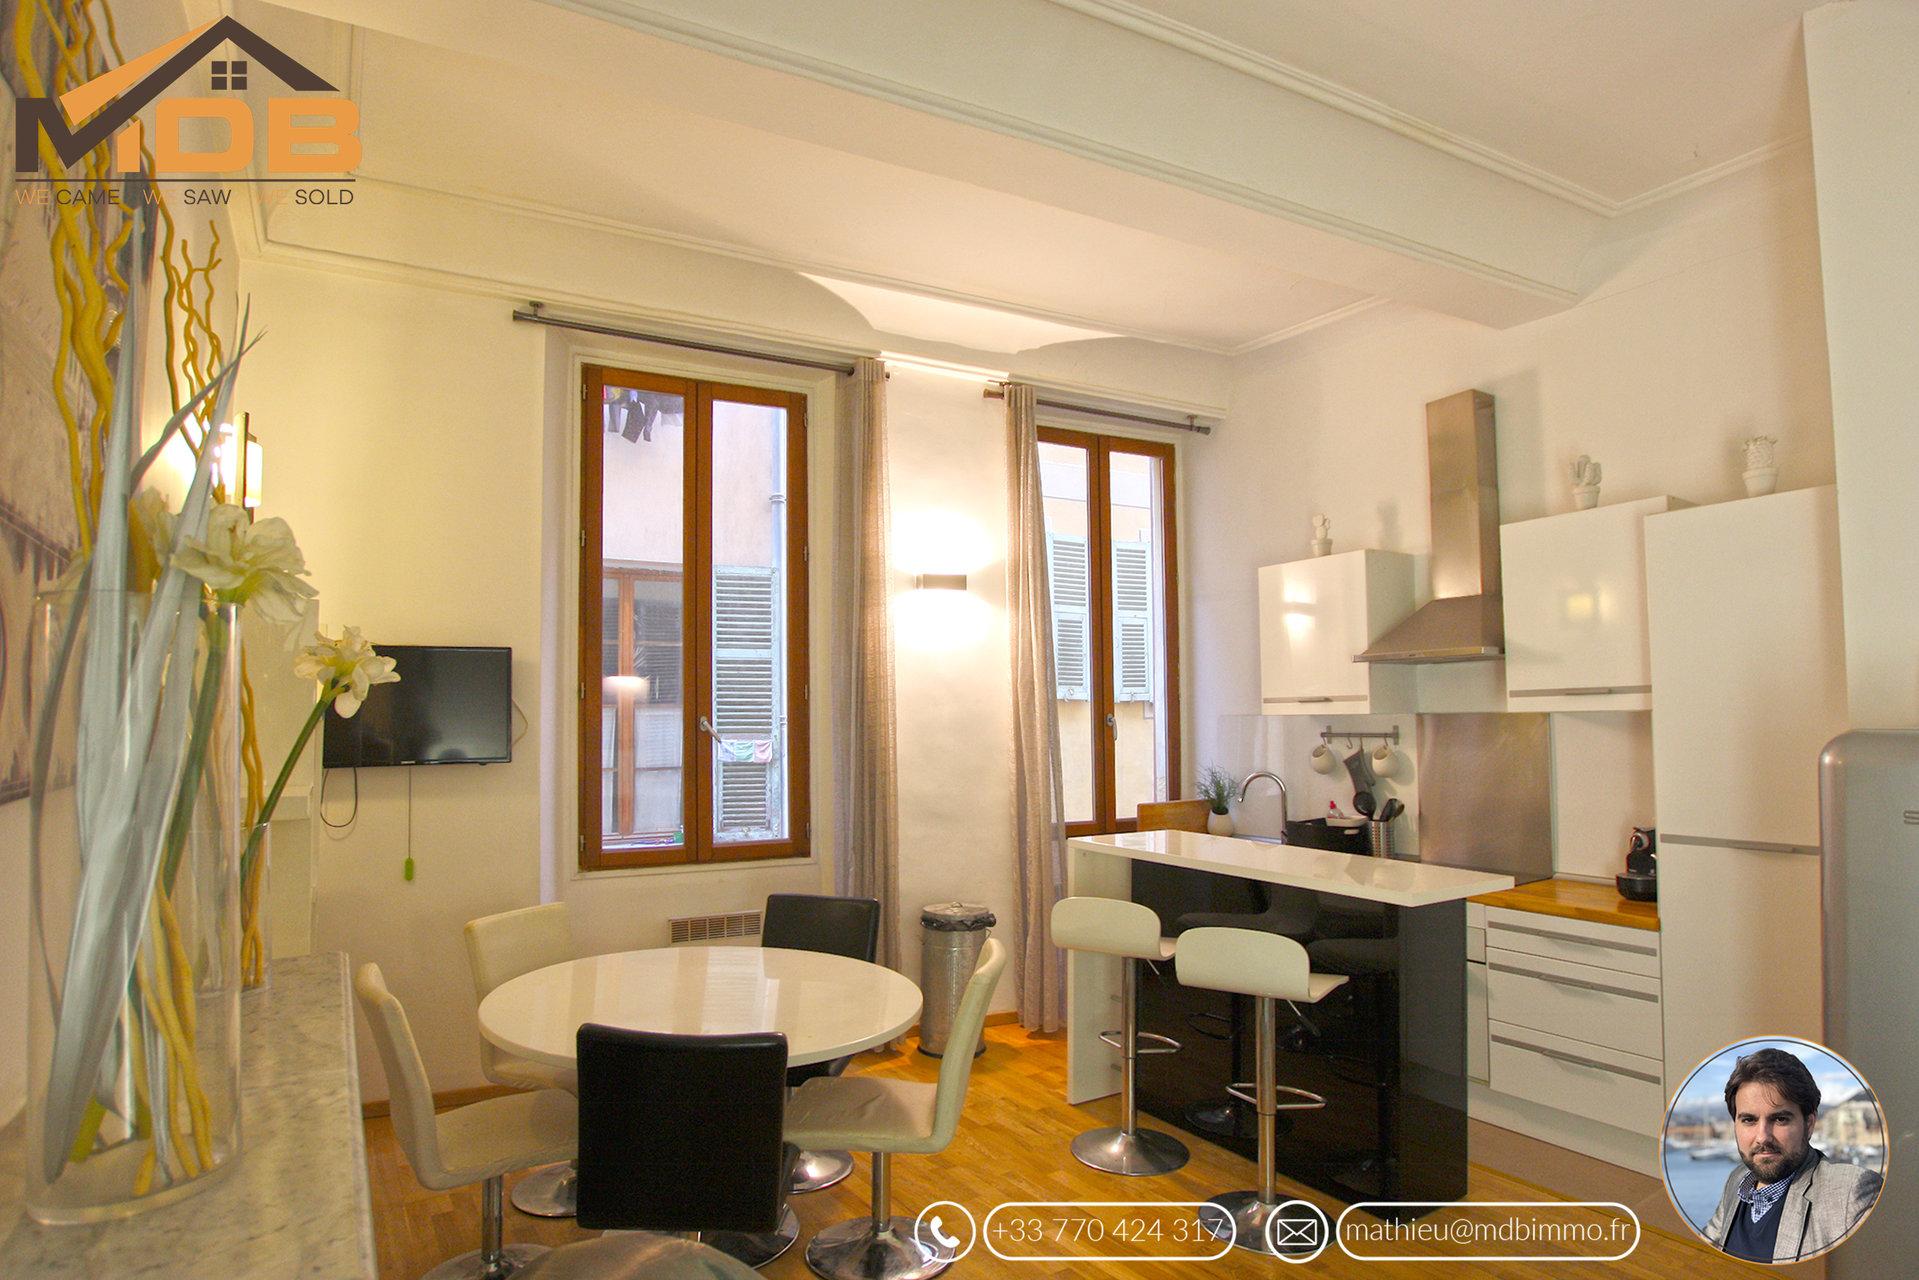 Vieux-Nice - 2 appartements (2p+studio) - Idéal investissement !